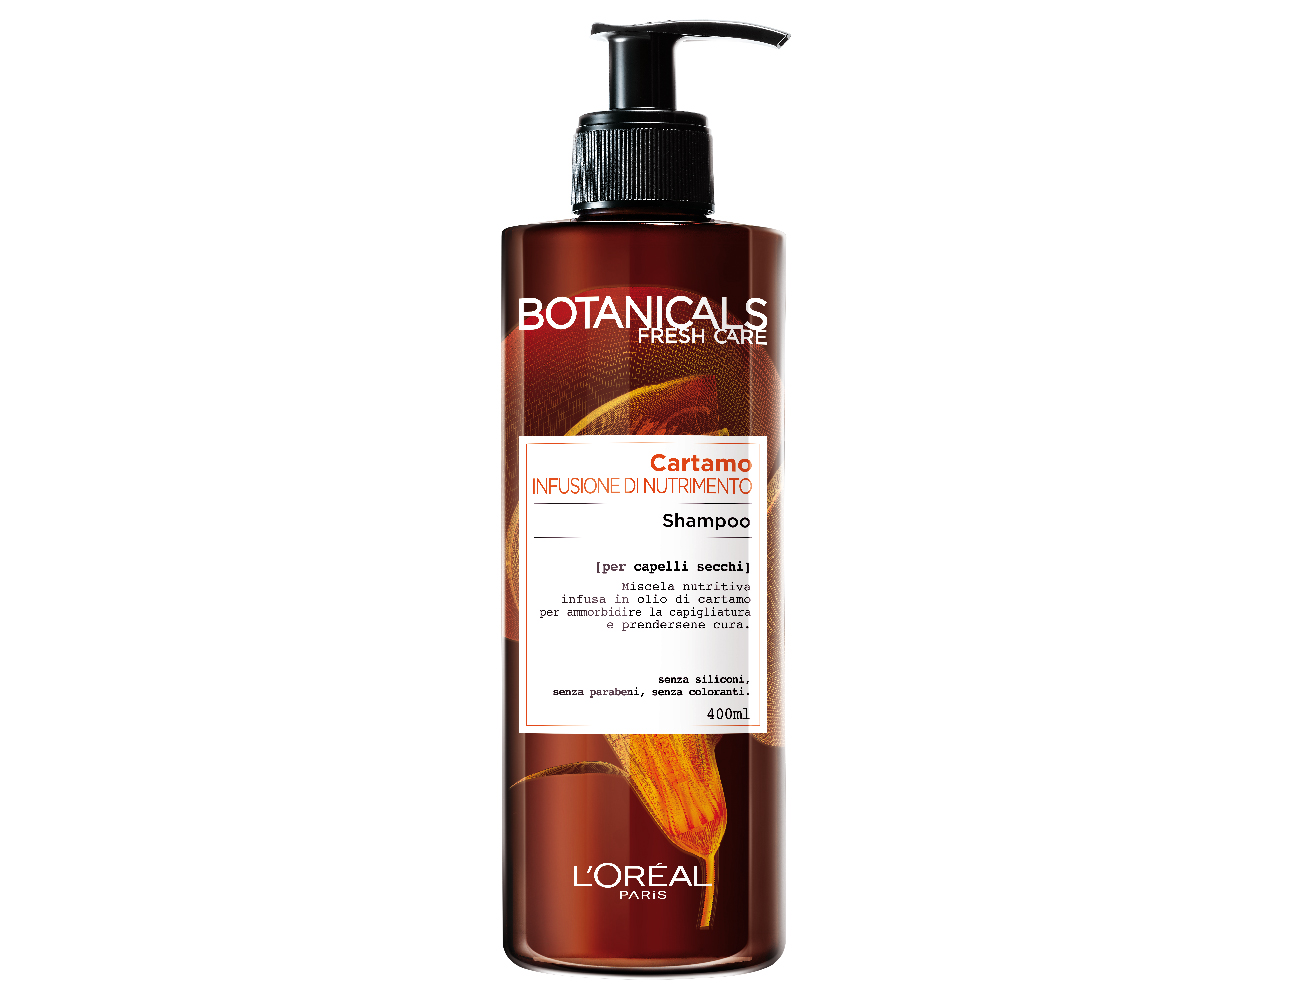 Image of Botanicals Fresh Care Shampoo Nutriente con Olio di Cartamo 400ml